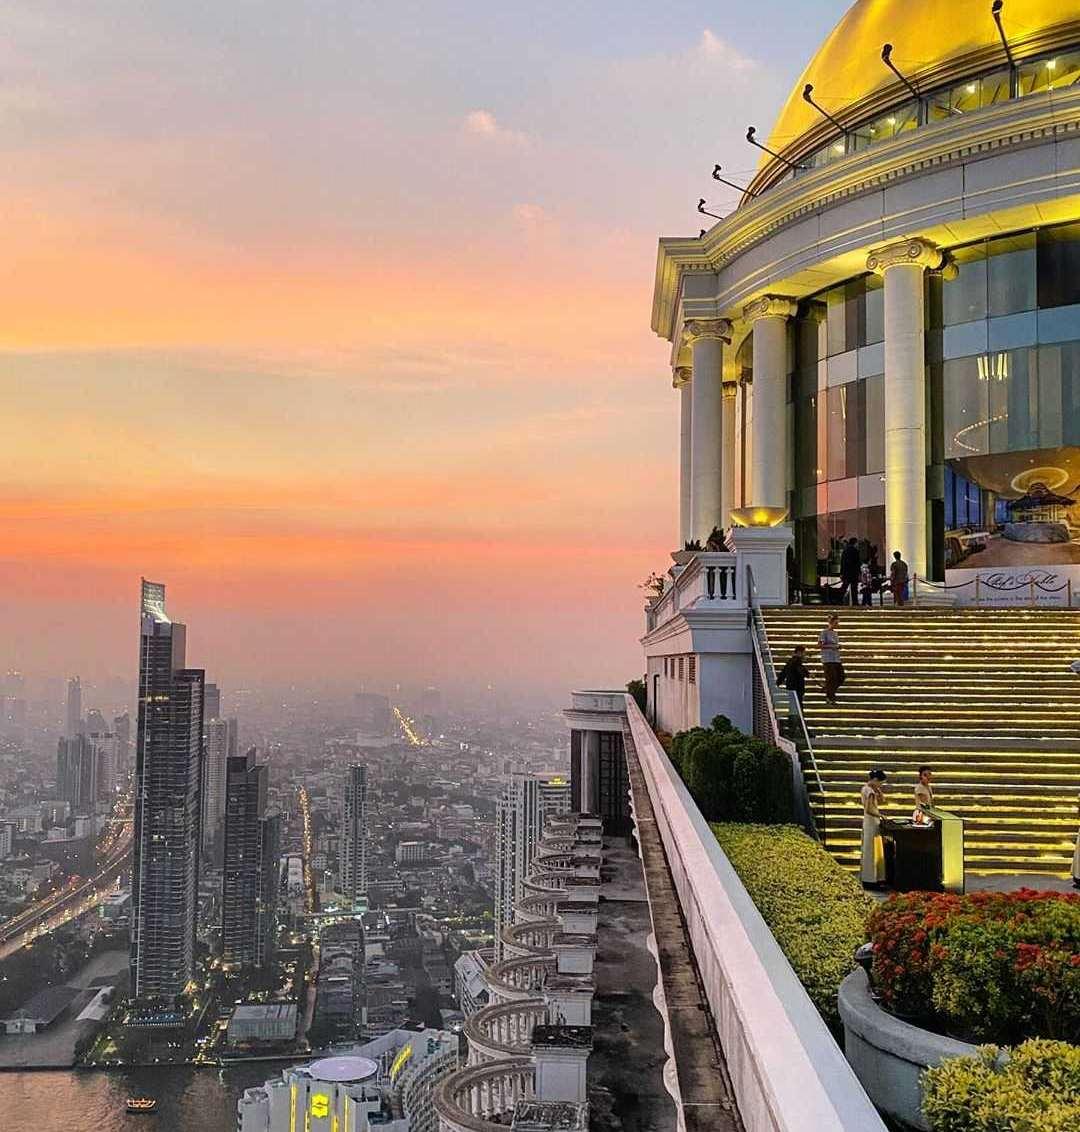 De Dome en uitzicht vanaf Sky Bar @ Lebua in Bangkok